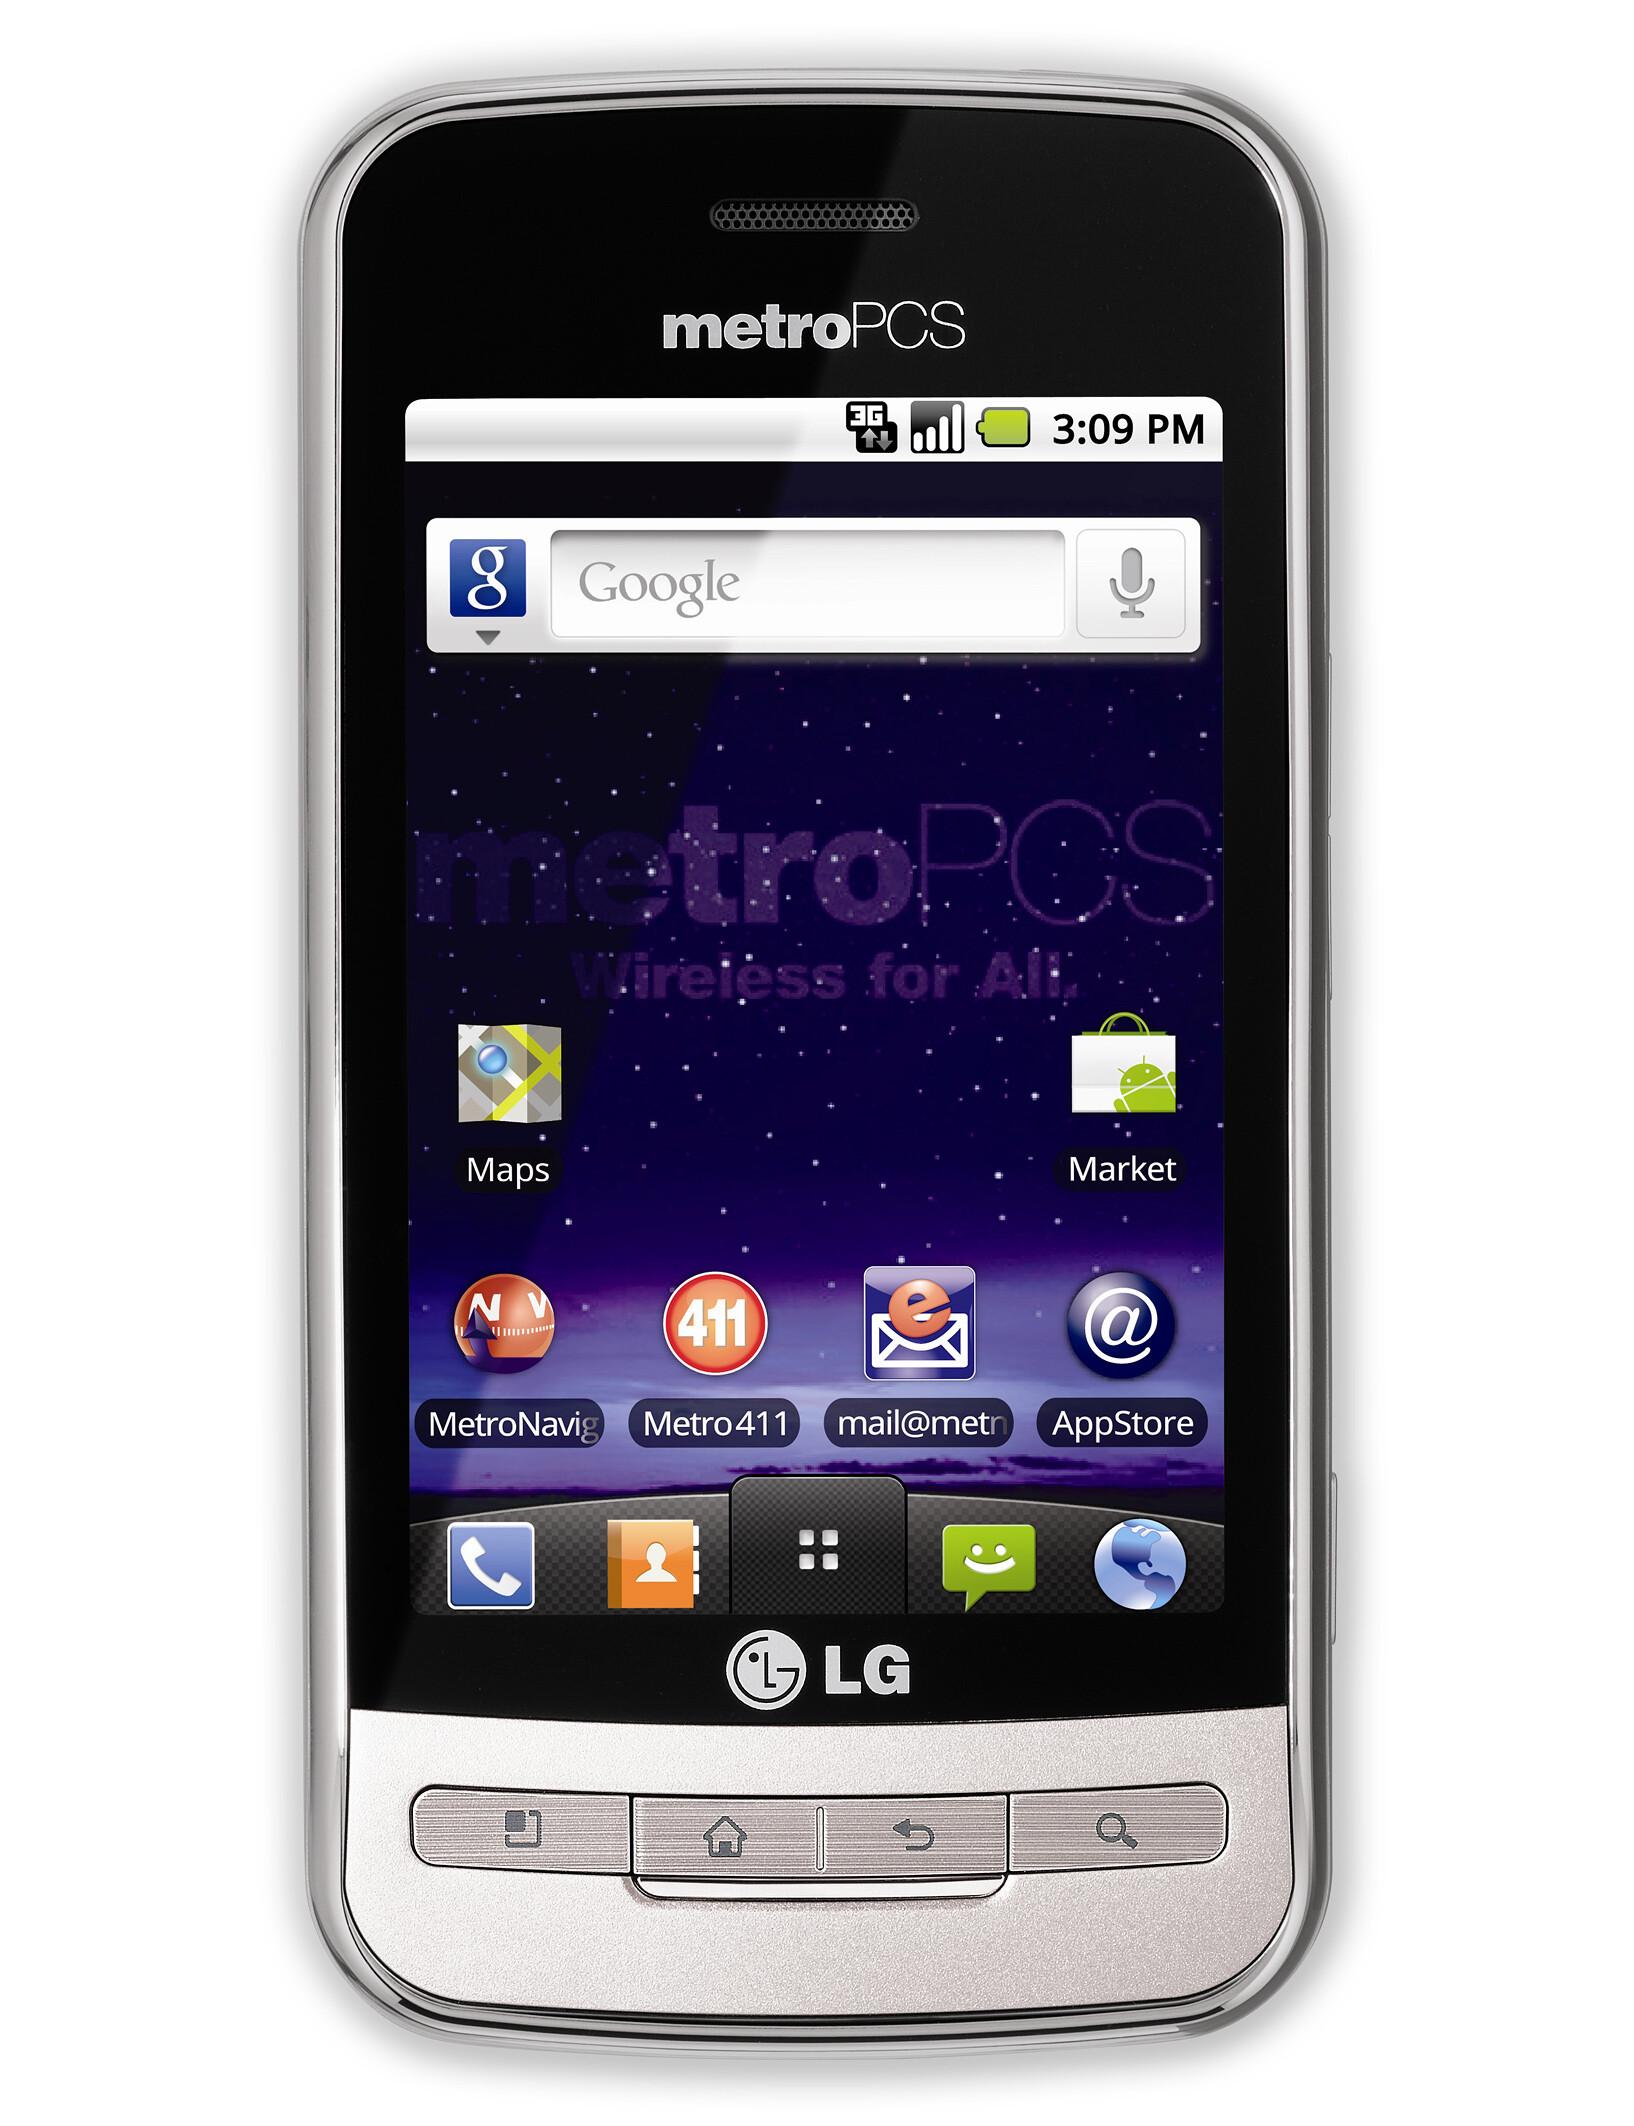 lg optimus m specs Verizon Cell Phone Manual Panasonic Phones Manuals